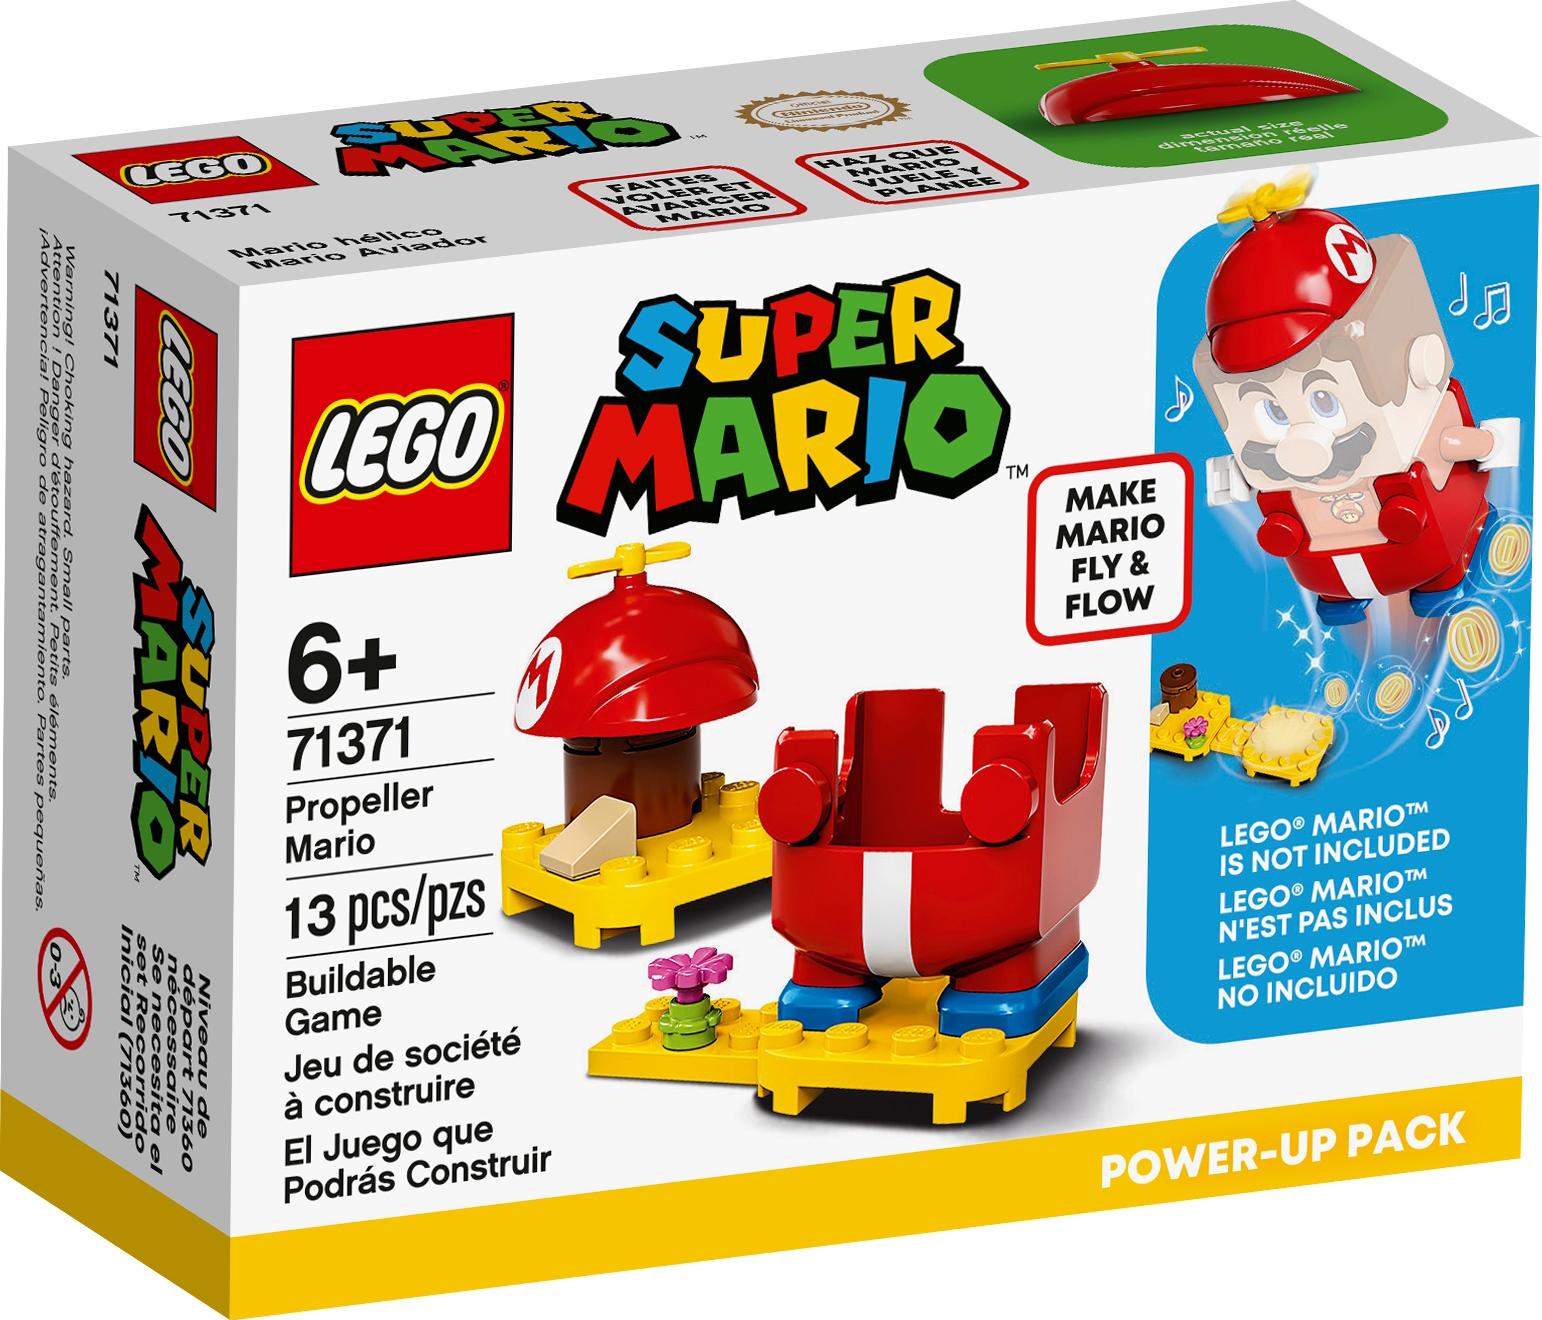 Propeller Mario Power-Up Pack